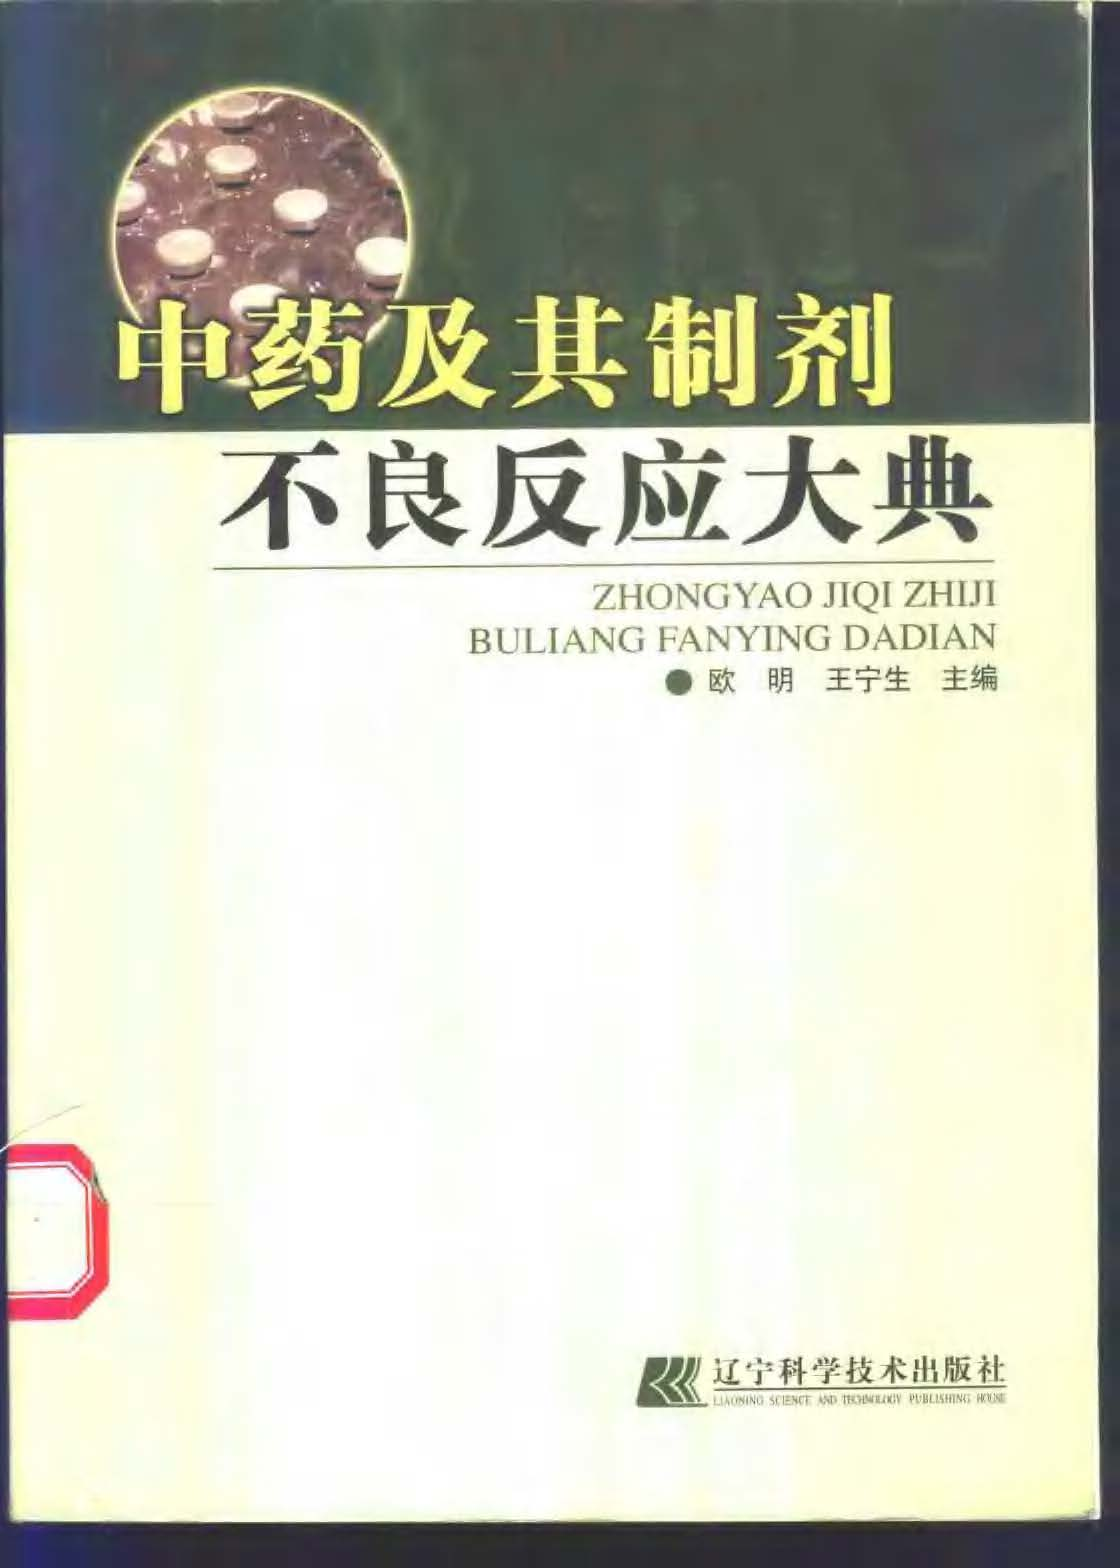 中药及其制剂不良反应大典 ZHONGYAO JIQI ZHIJI BULIANG FANYING DADIAN